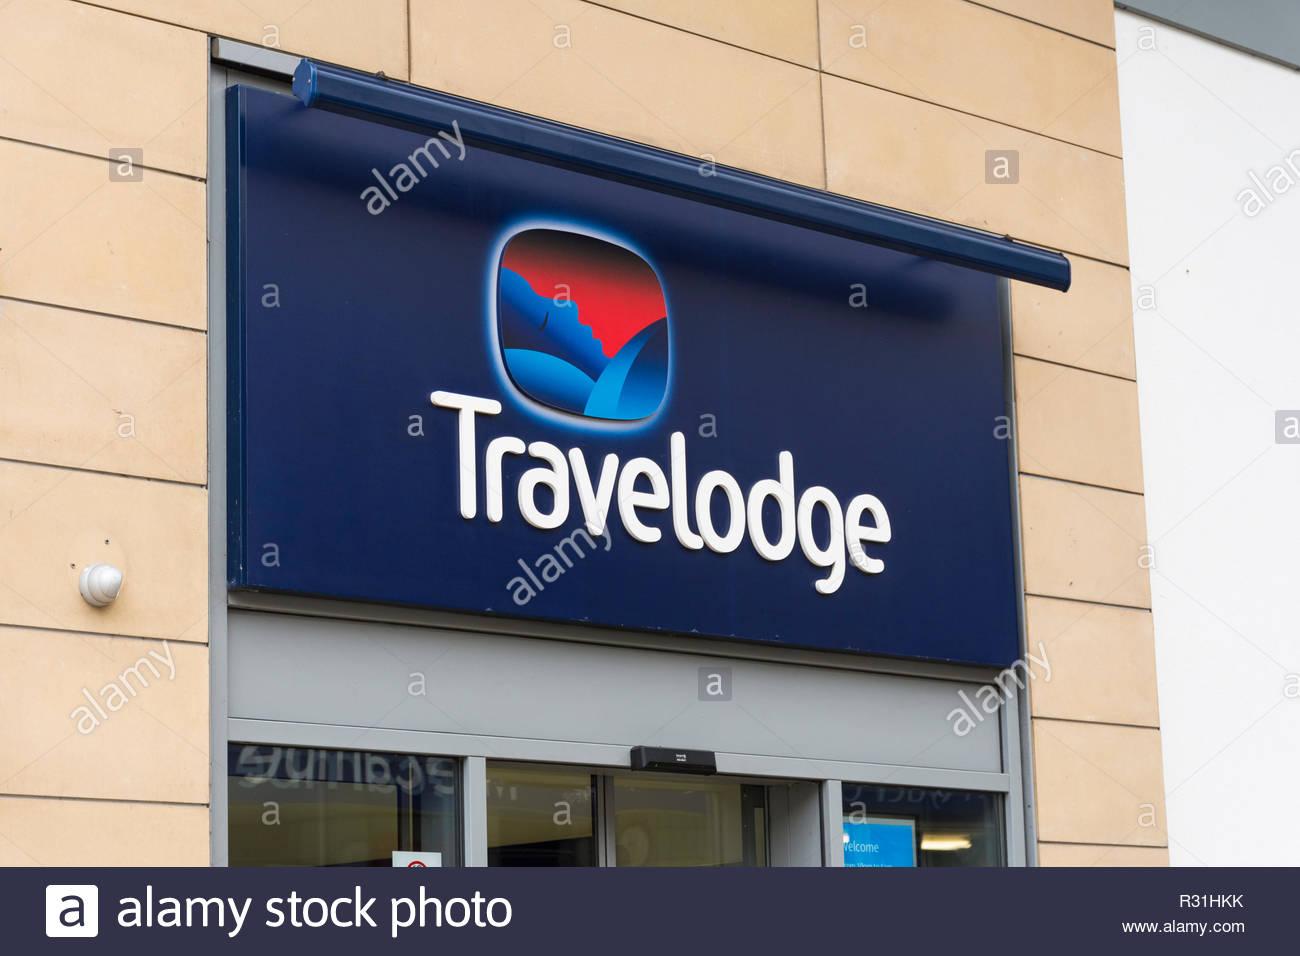 A Travelodge hotel in Euston Road, Morecambe, Lancashire - Stock Image